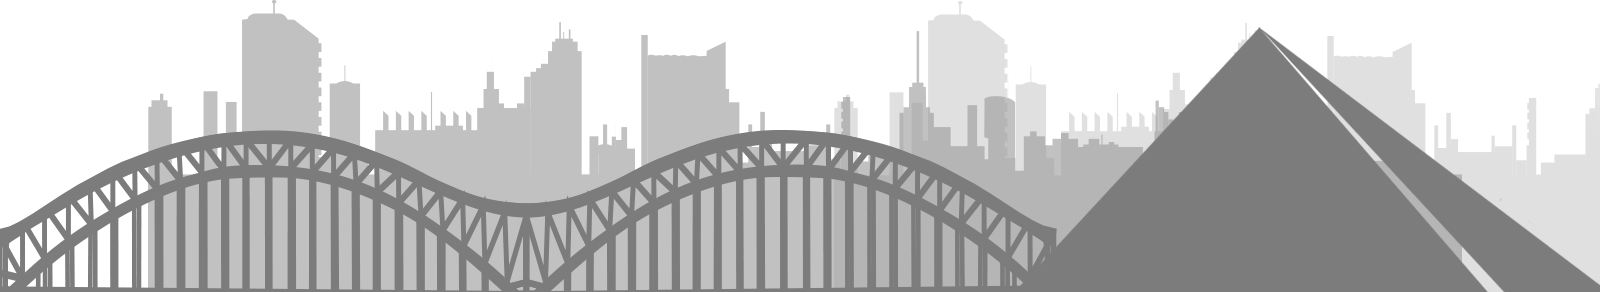 memphis-skyline-bottom